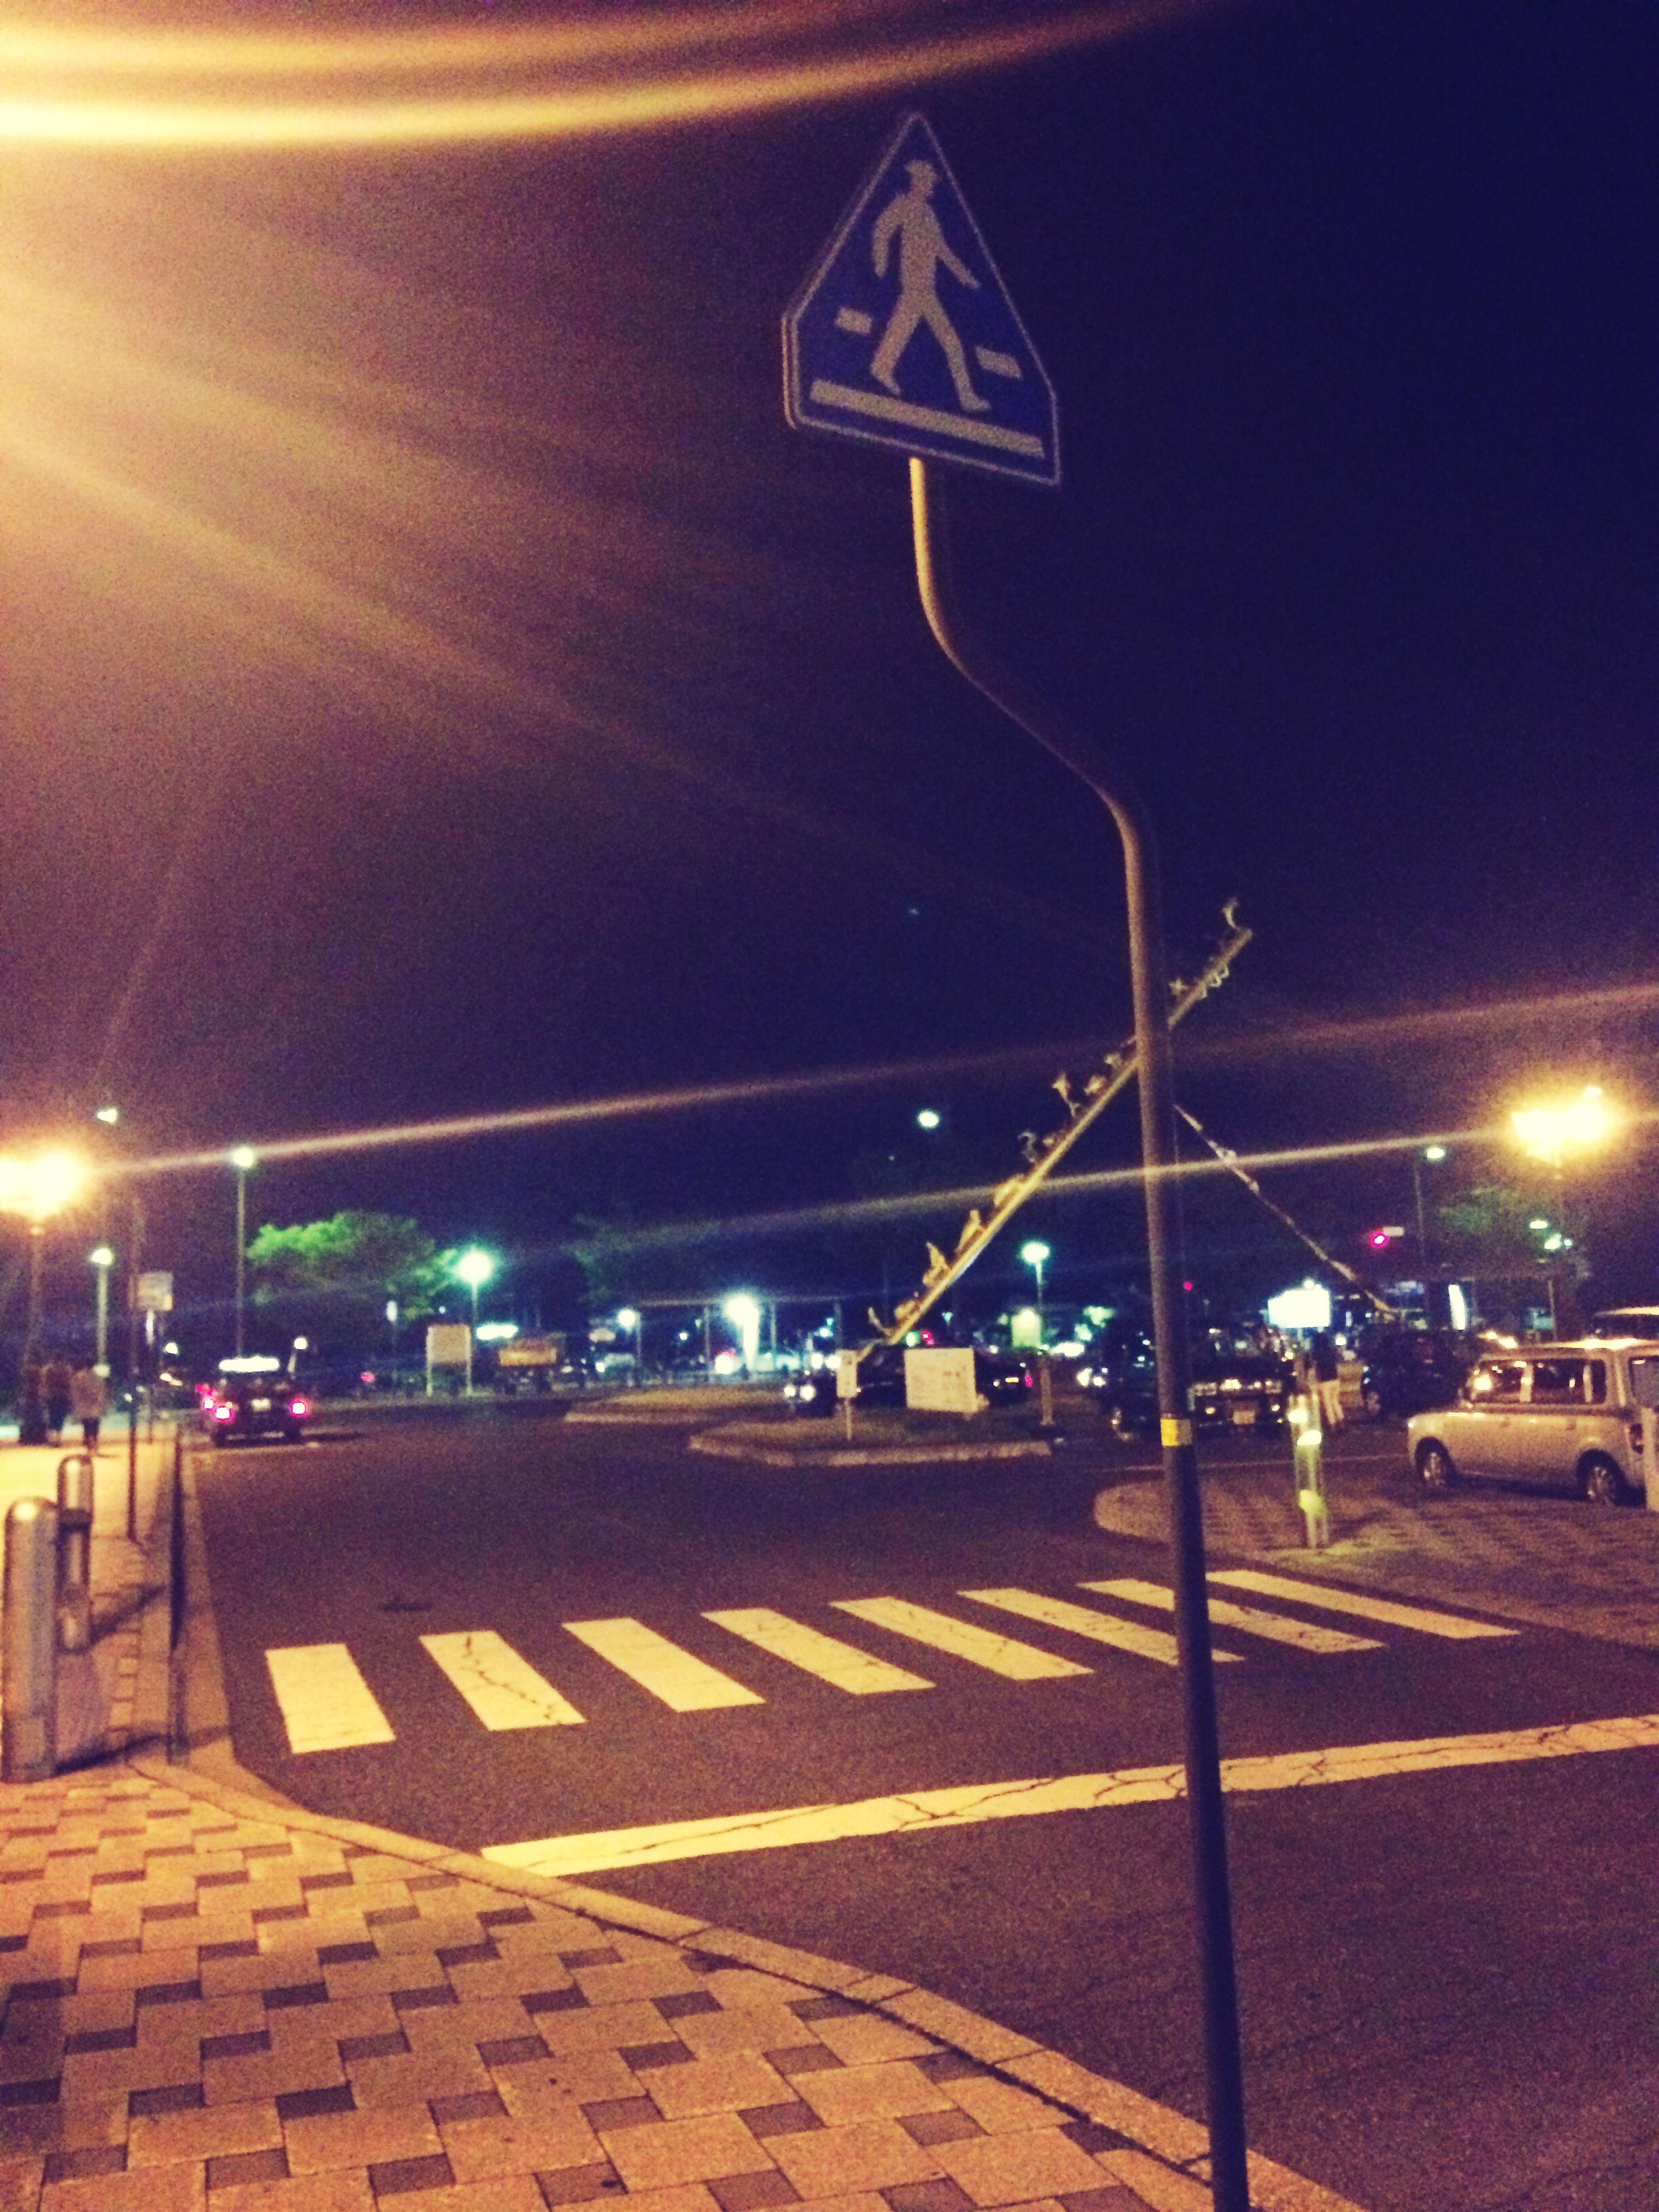 illuminated, night, street light, transportation, street, road, lighting equipment, road marking, road sign, the way forward, city street, guidance, city, car, communication, zebra crossing, arrow symbol, sky, text, sign